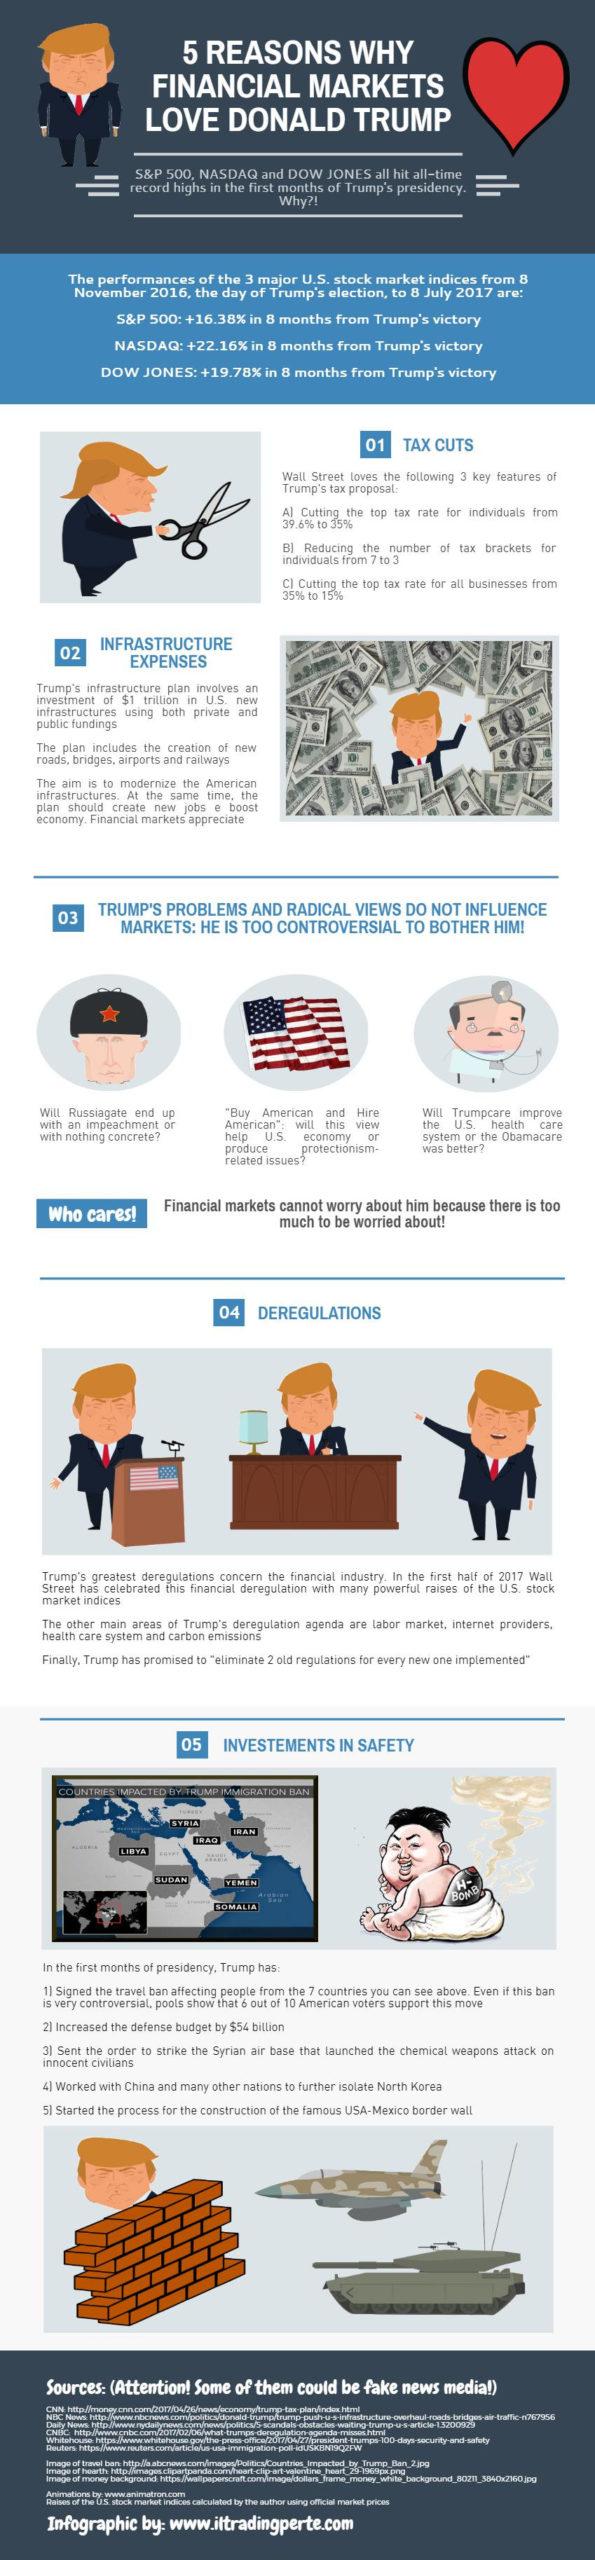 5 reasons why financial markets love donald trump